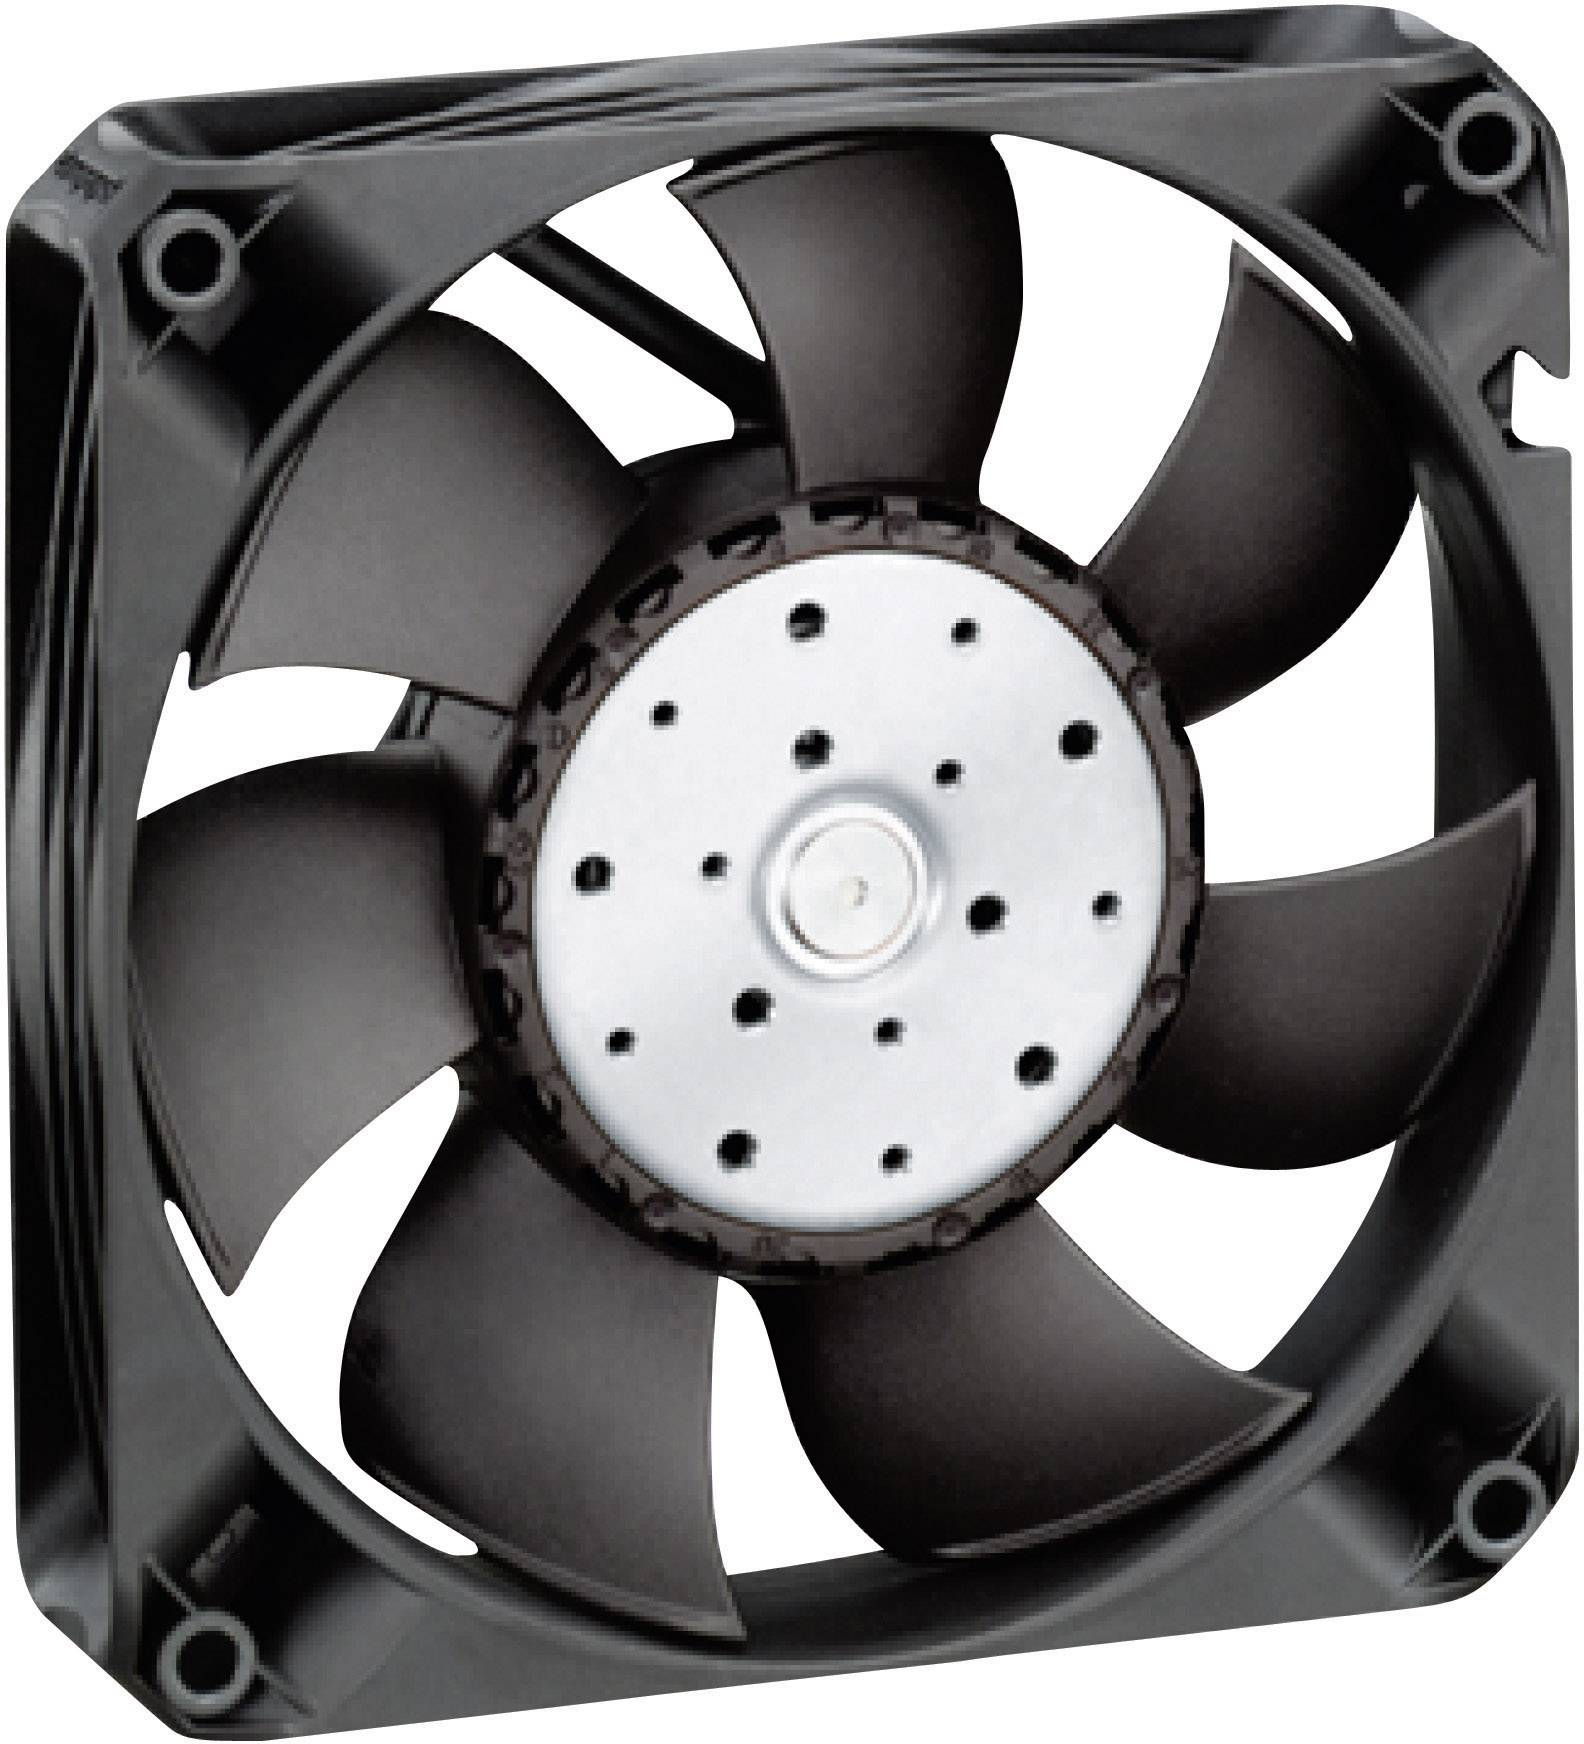 Axiálny ventilátor EBM Papst, 55 dBA, 119 x 119 x 25 mm